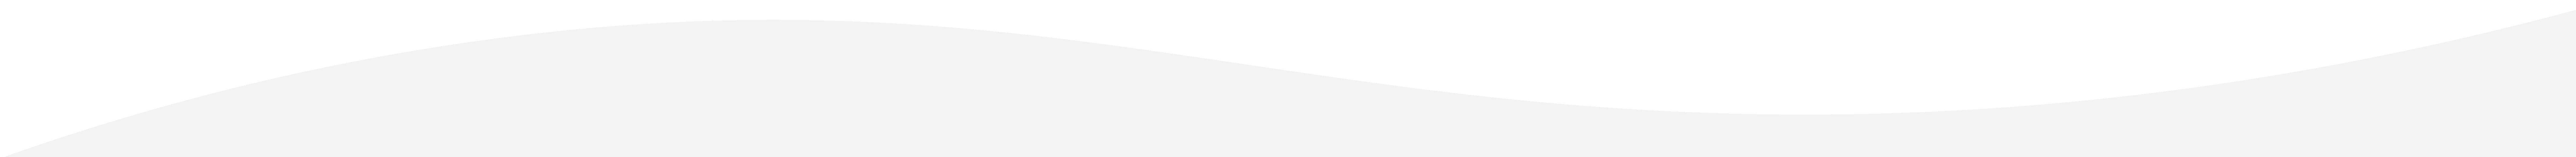 Banner-background-image